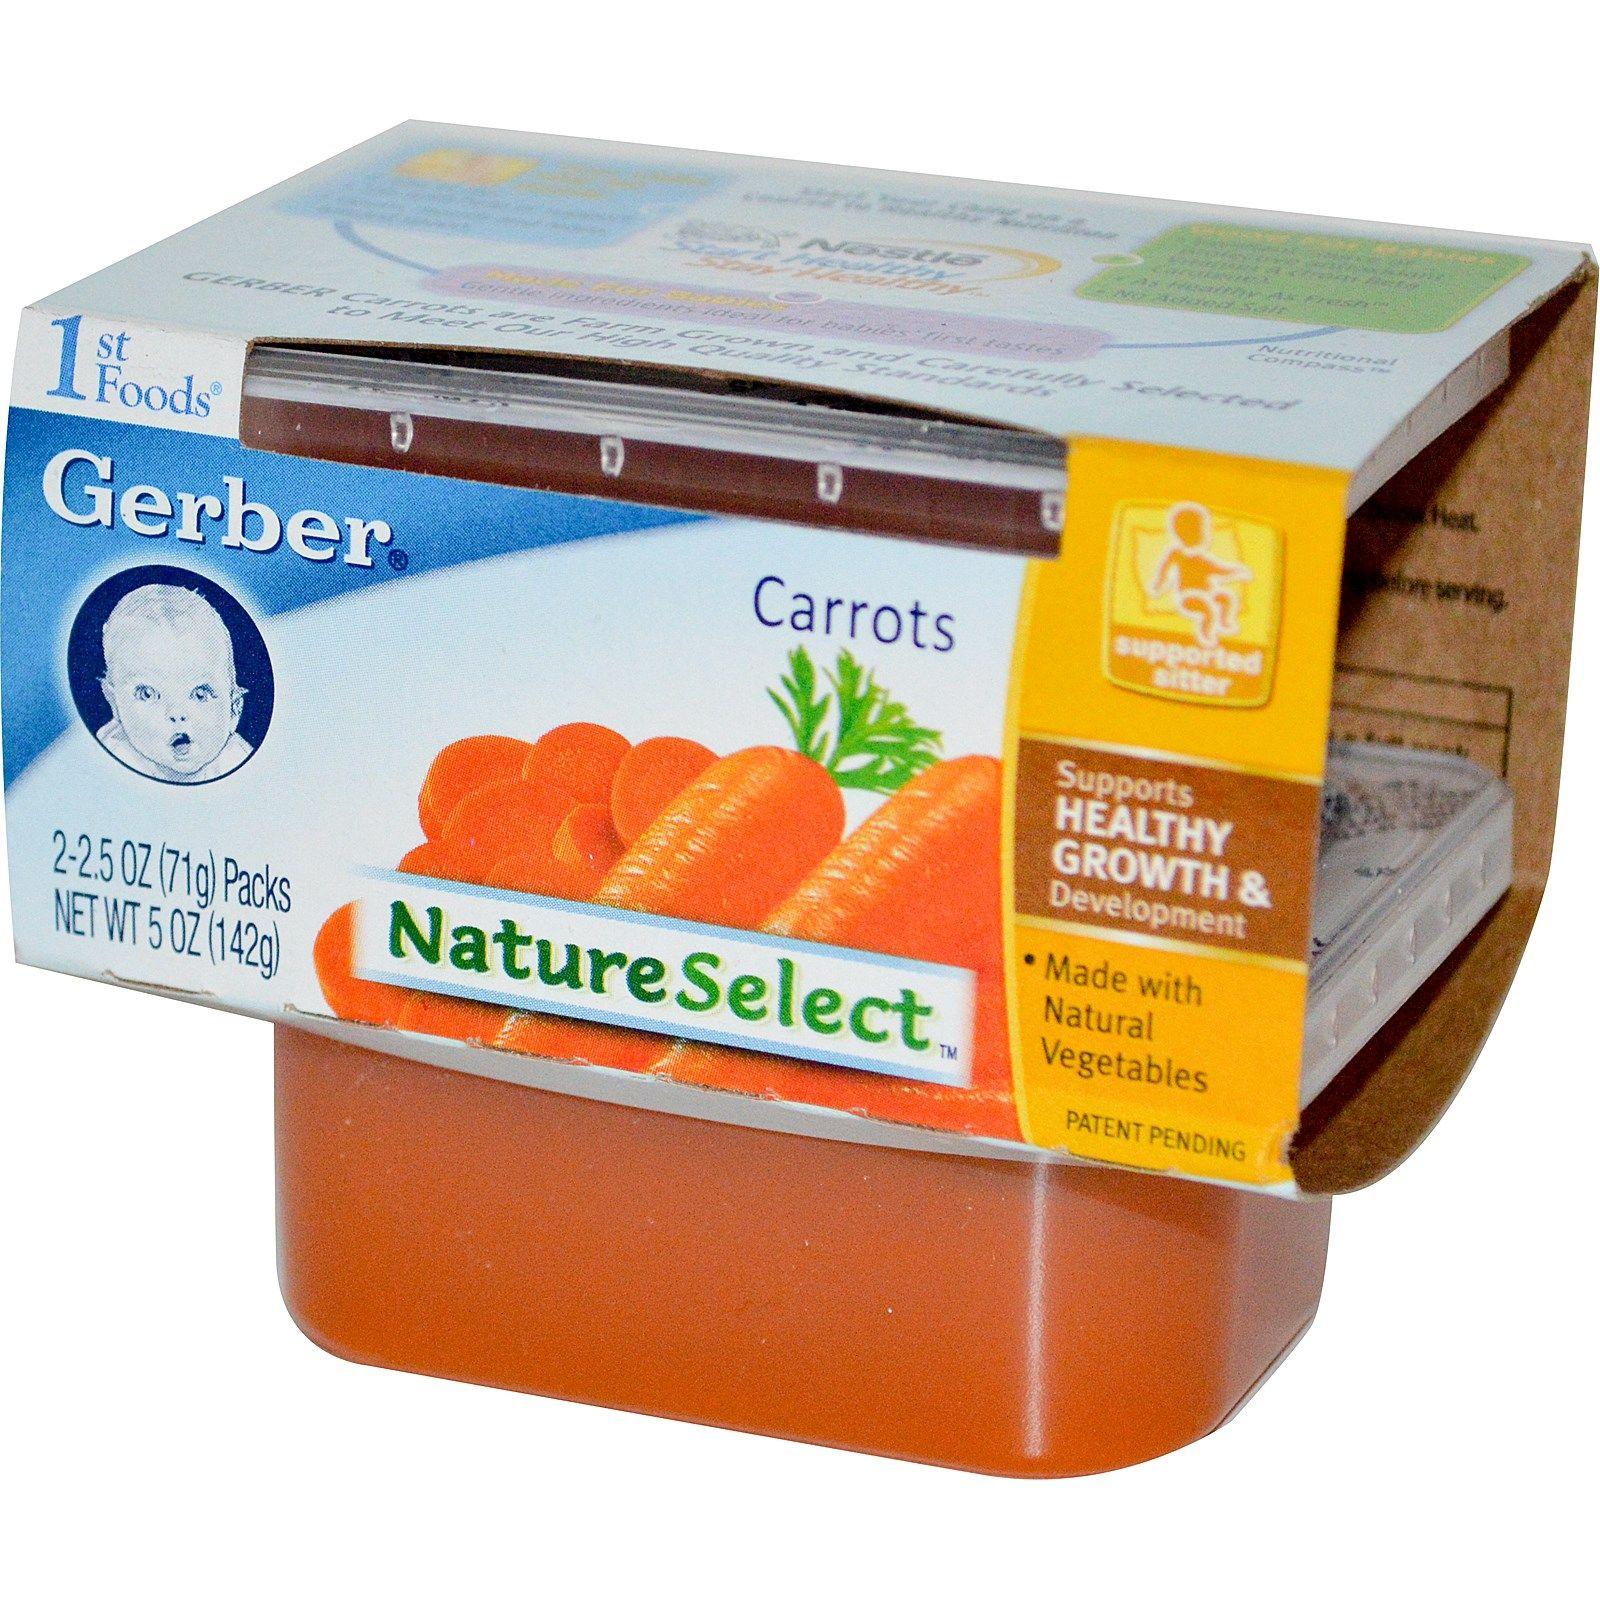 Gerber 1st foods natureselect carrots 2 packs 25 oz